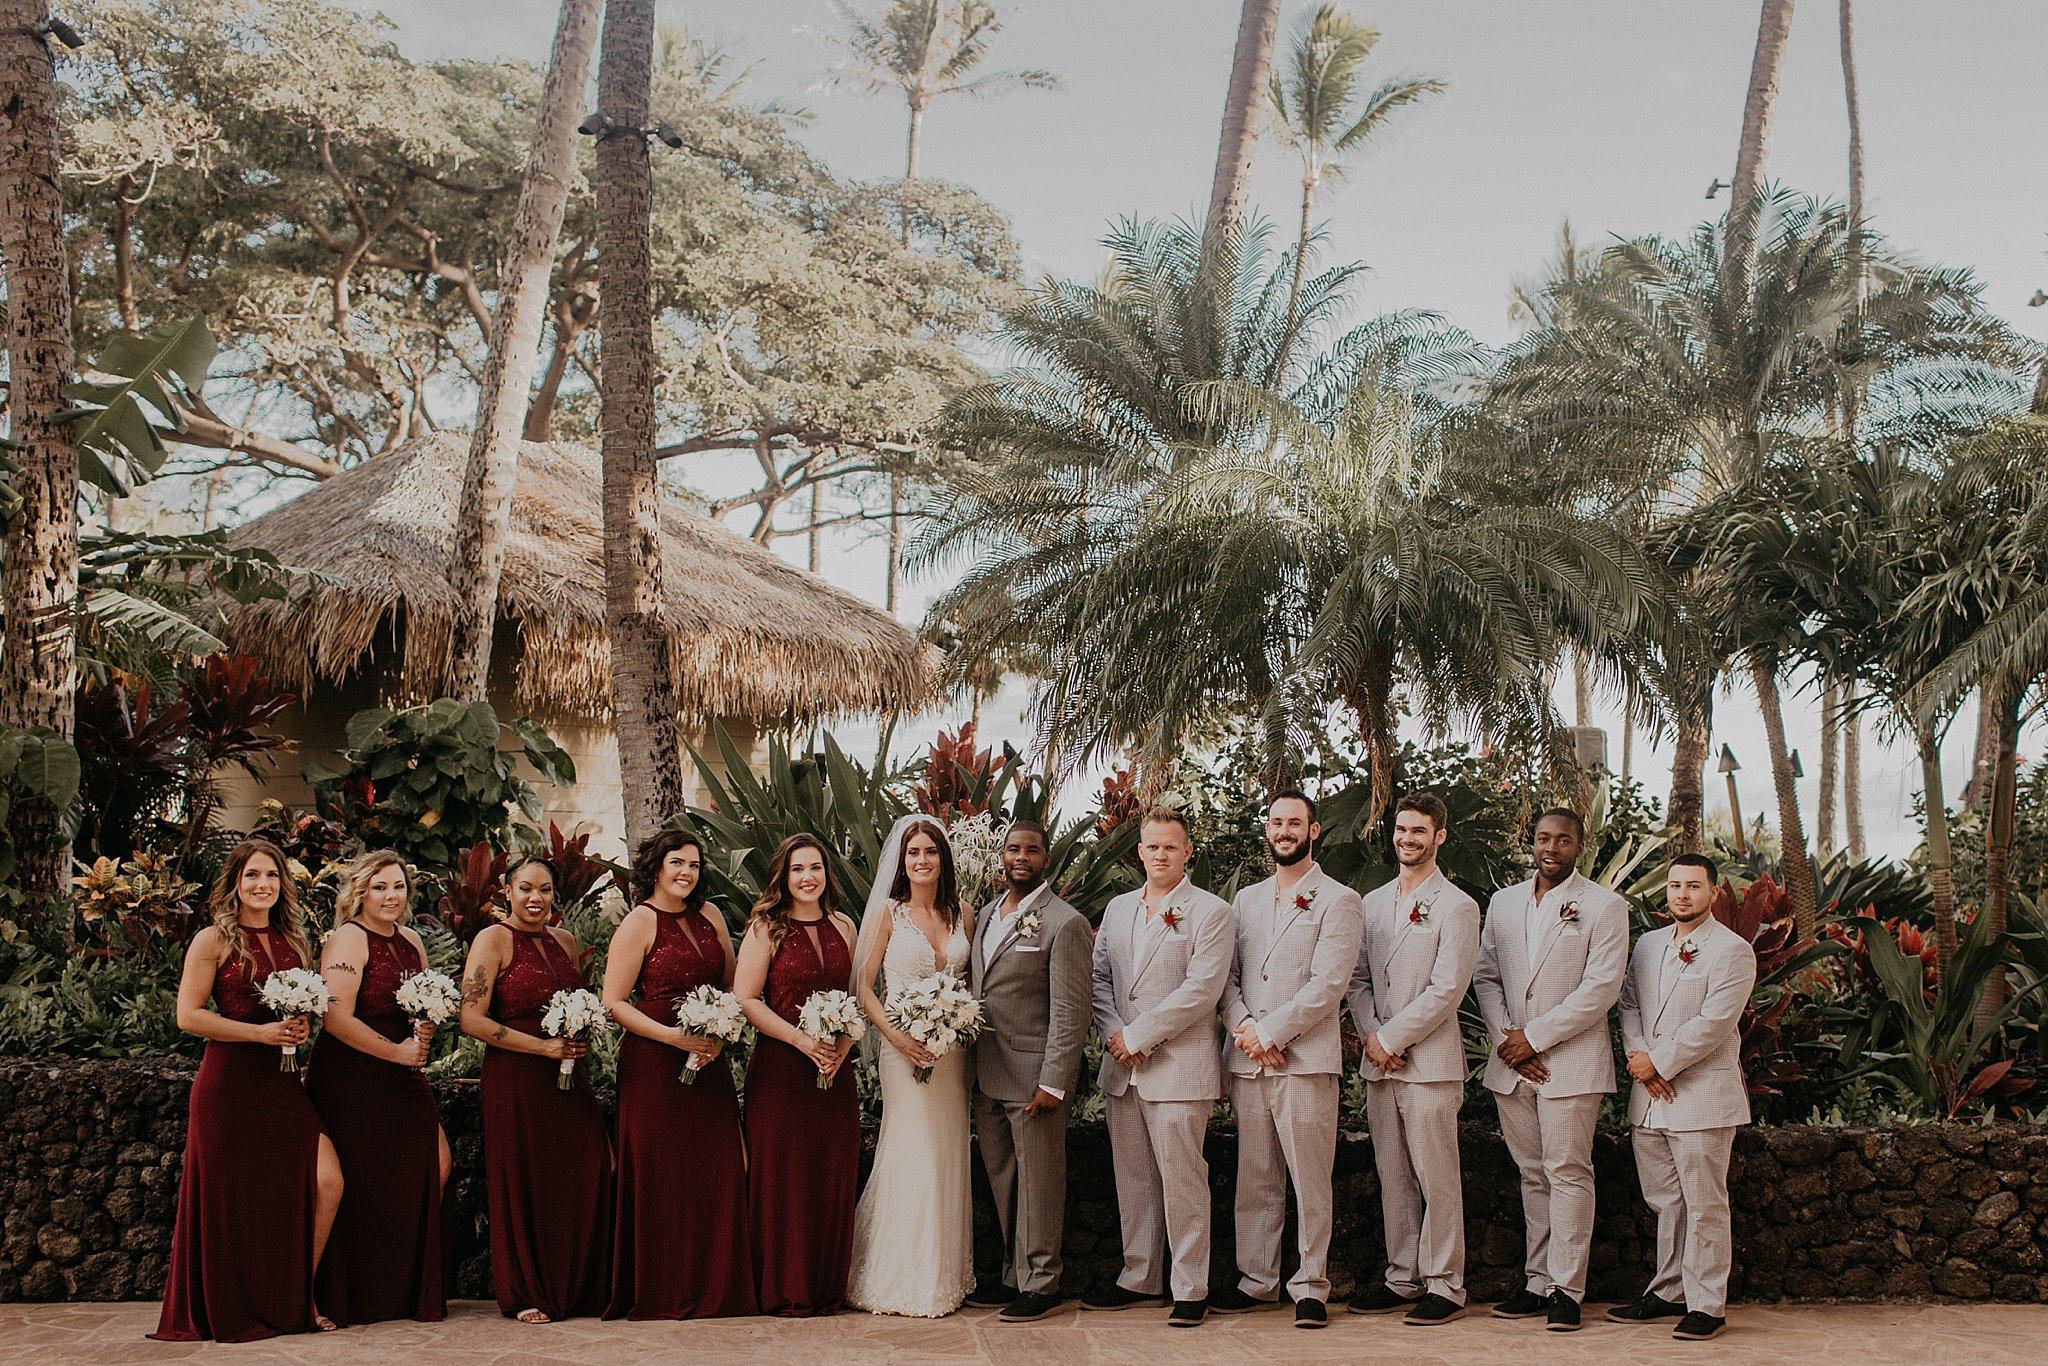 samantha_mcfarlen_bellingham_washington_engagement_photography_seattle_wedding_photographer_0222.jpg